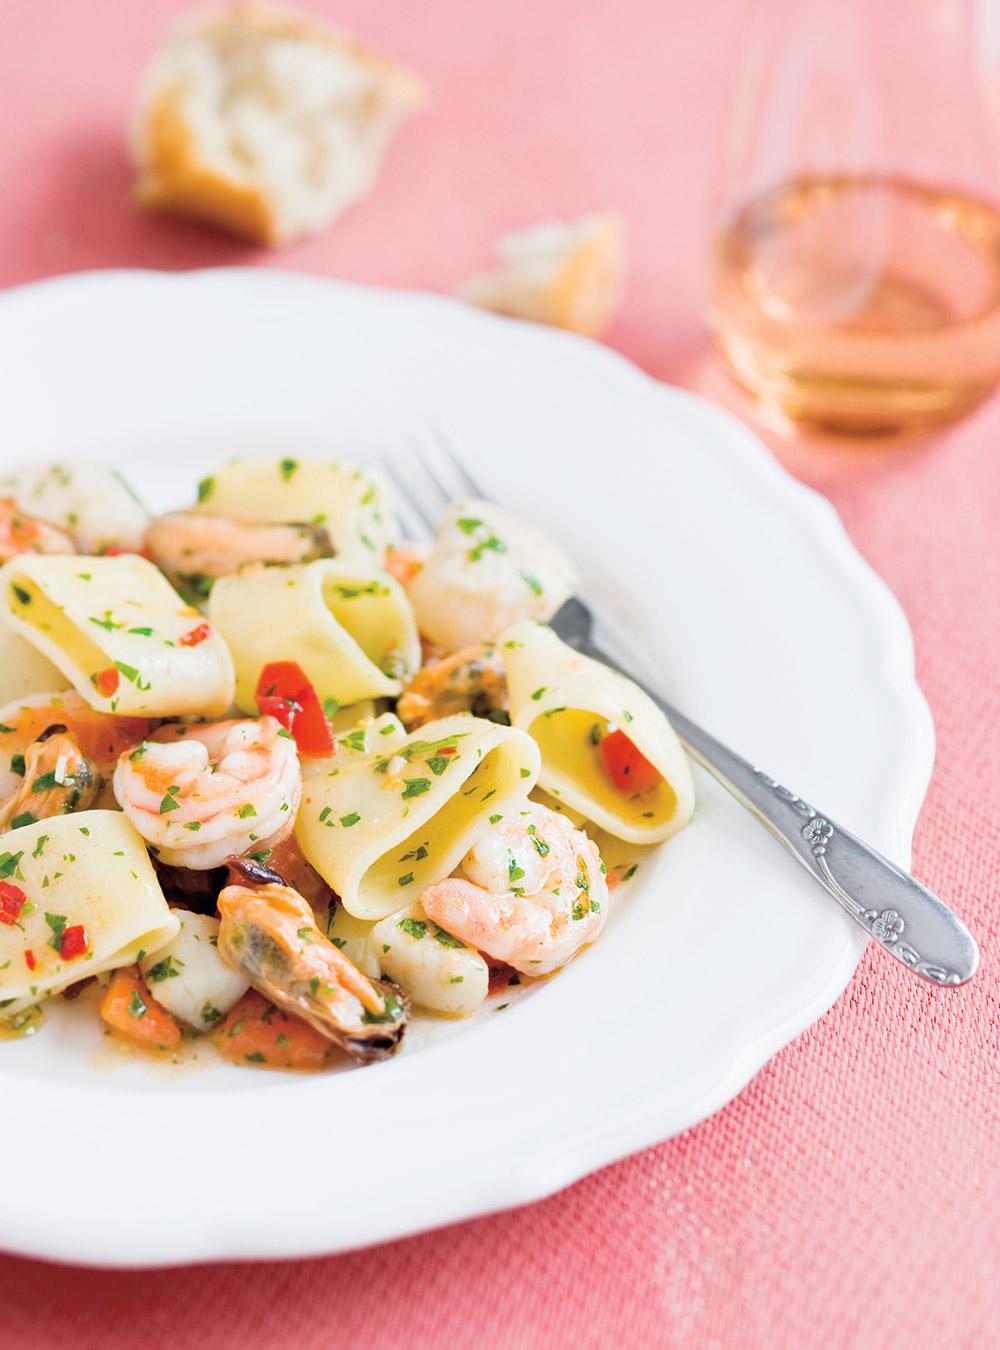 Cuisine italienne pates p tes au citron et pavot u2013 - Youtube cuisine italienne ...